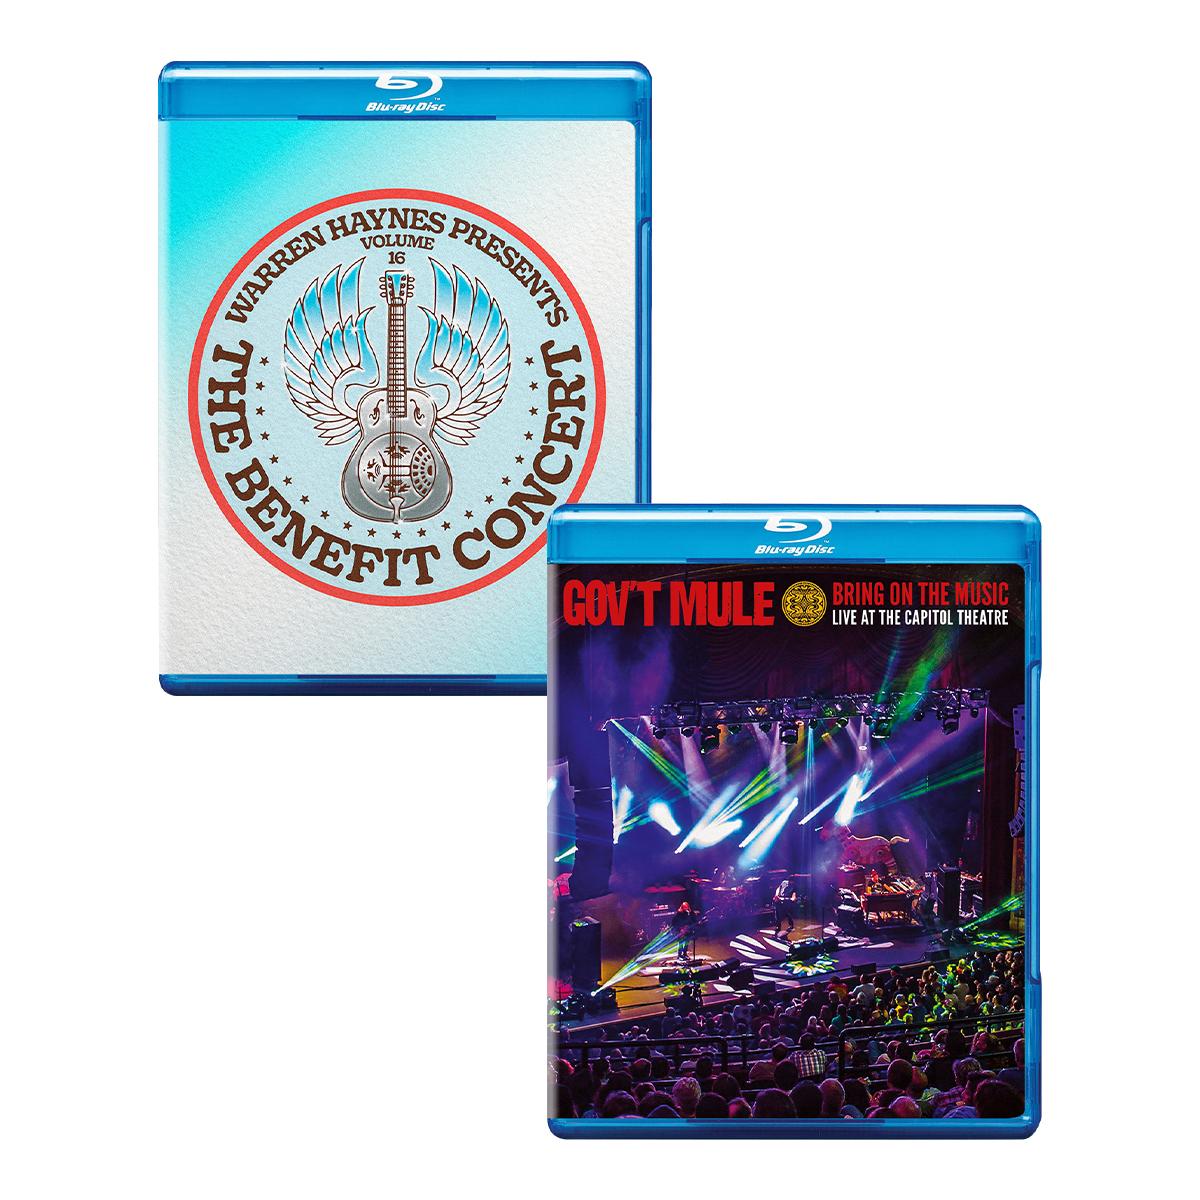 Blu-Ray Bundle:  Benefit Concert Vol 16 & BOTM